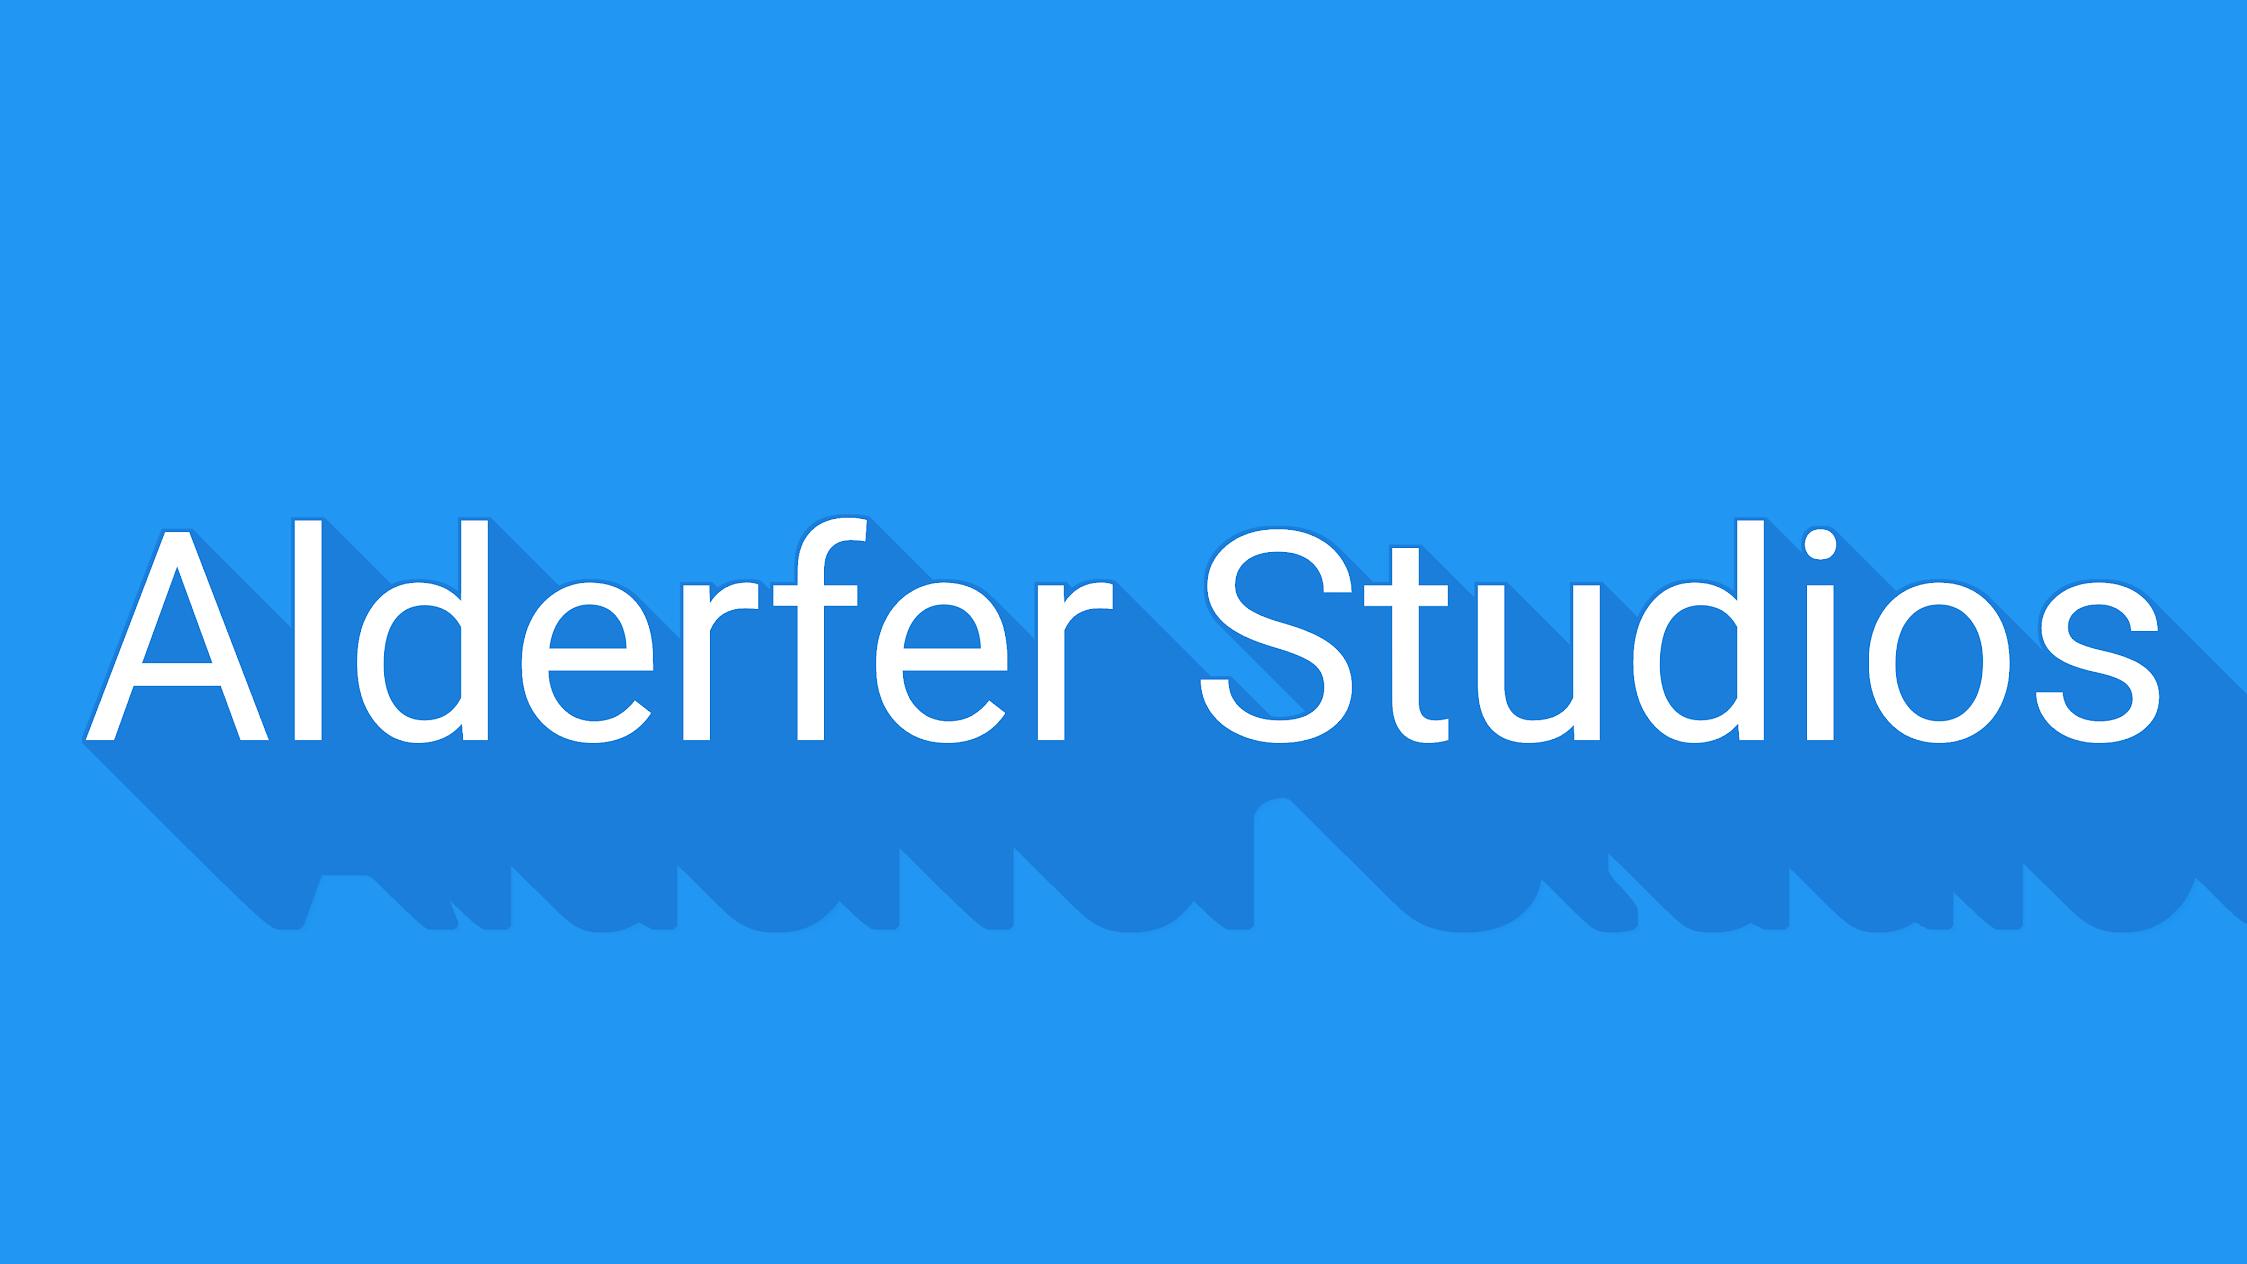 Alderfer Studios